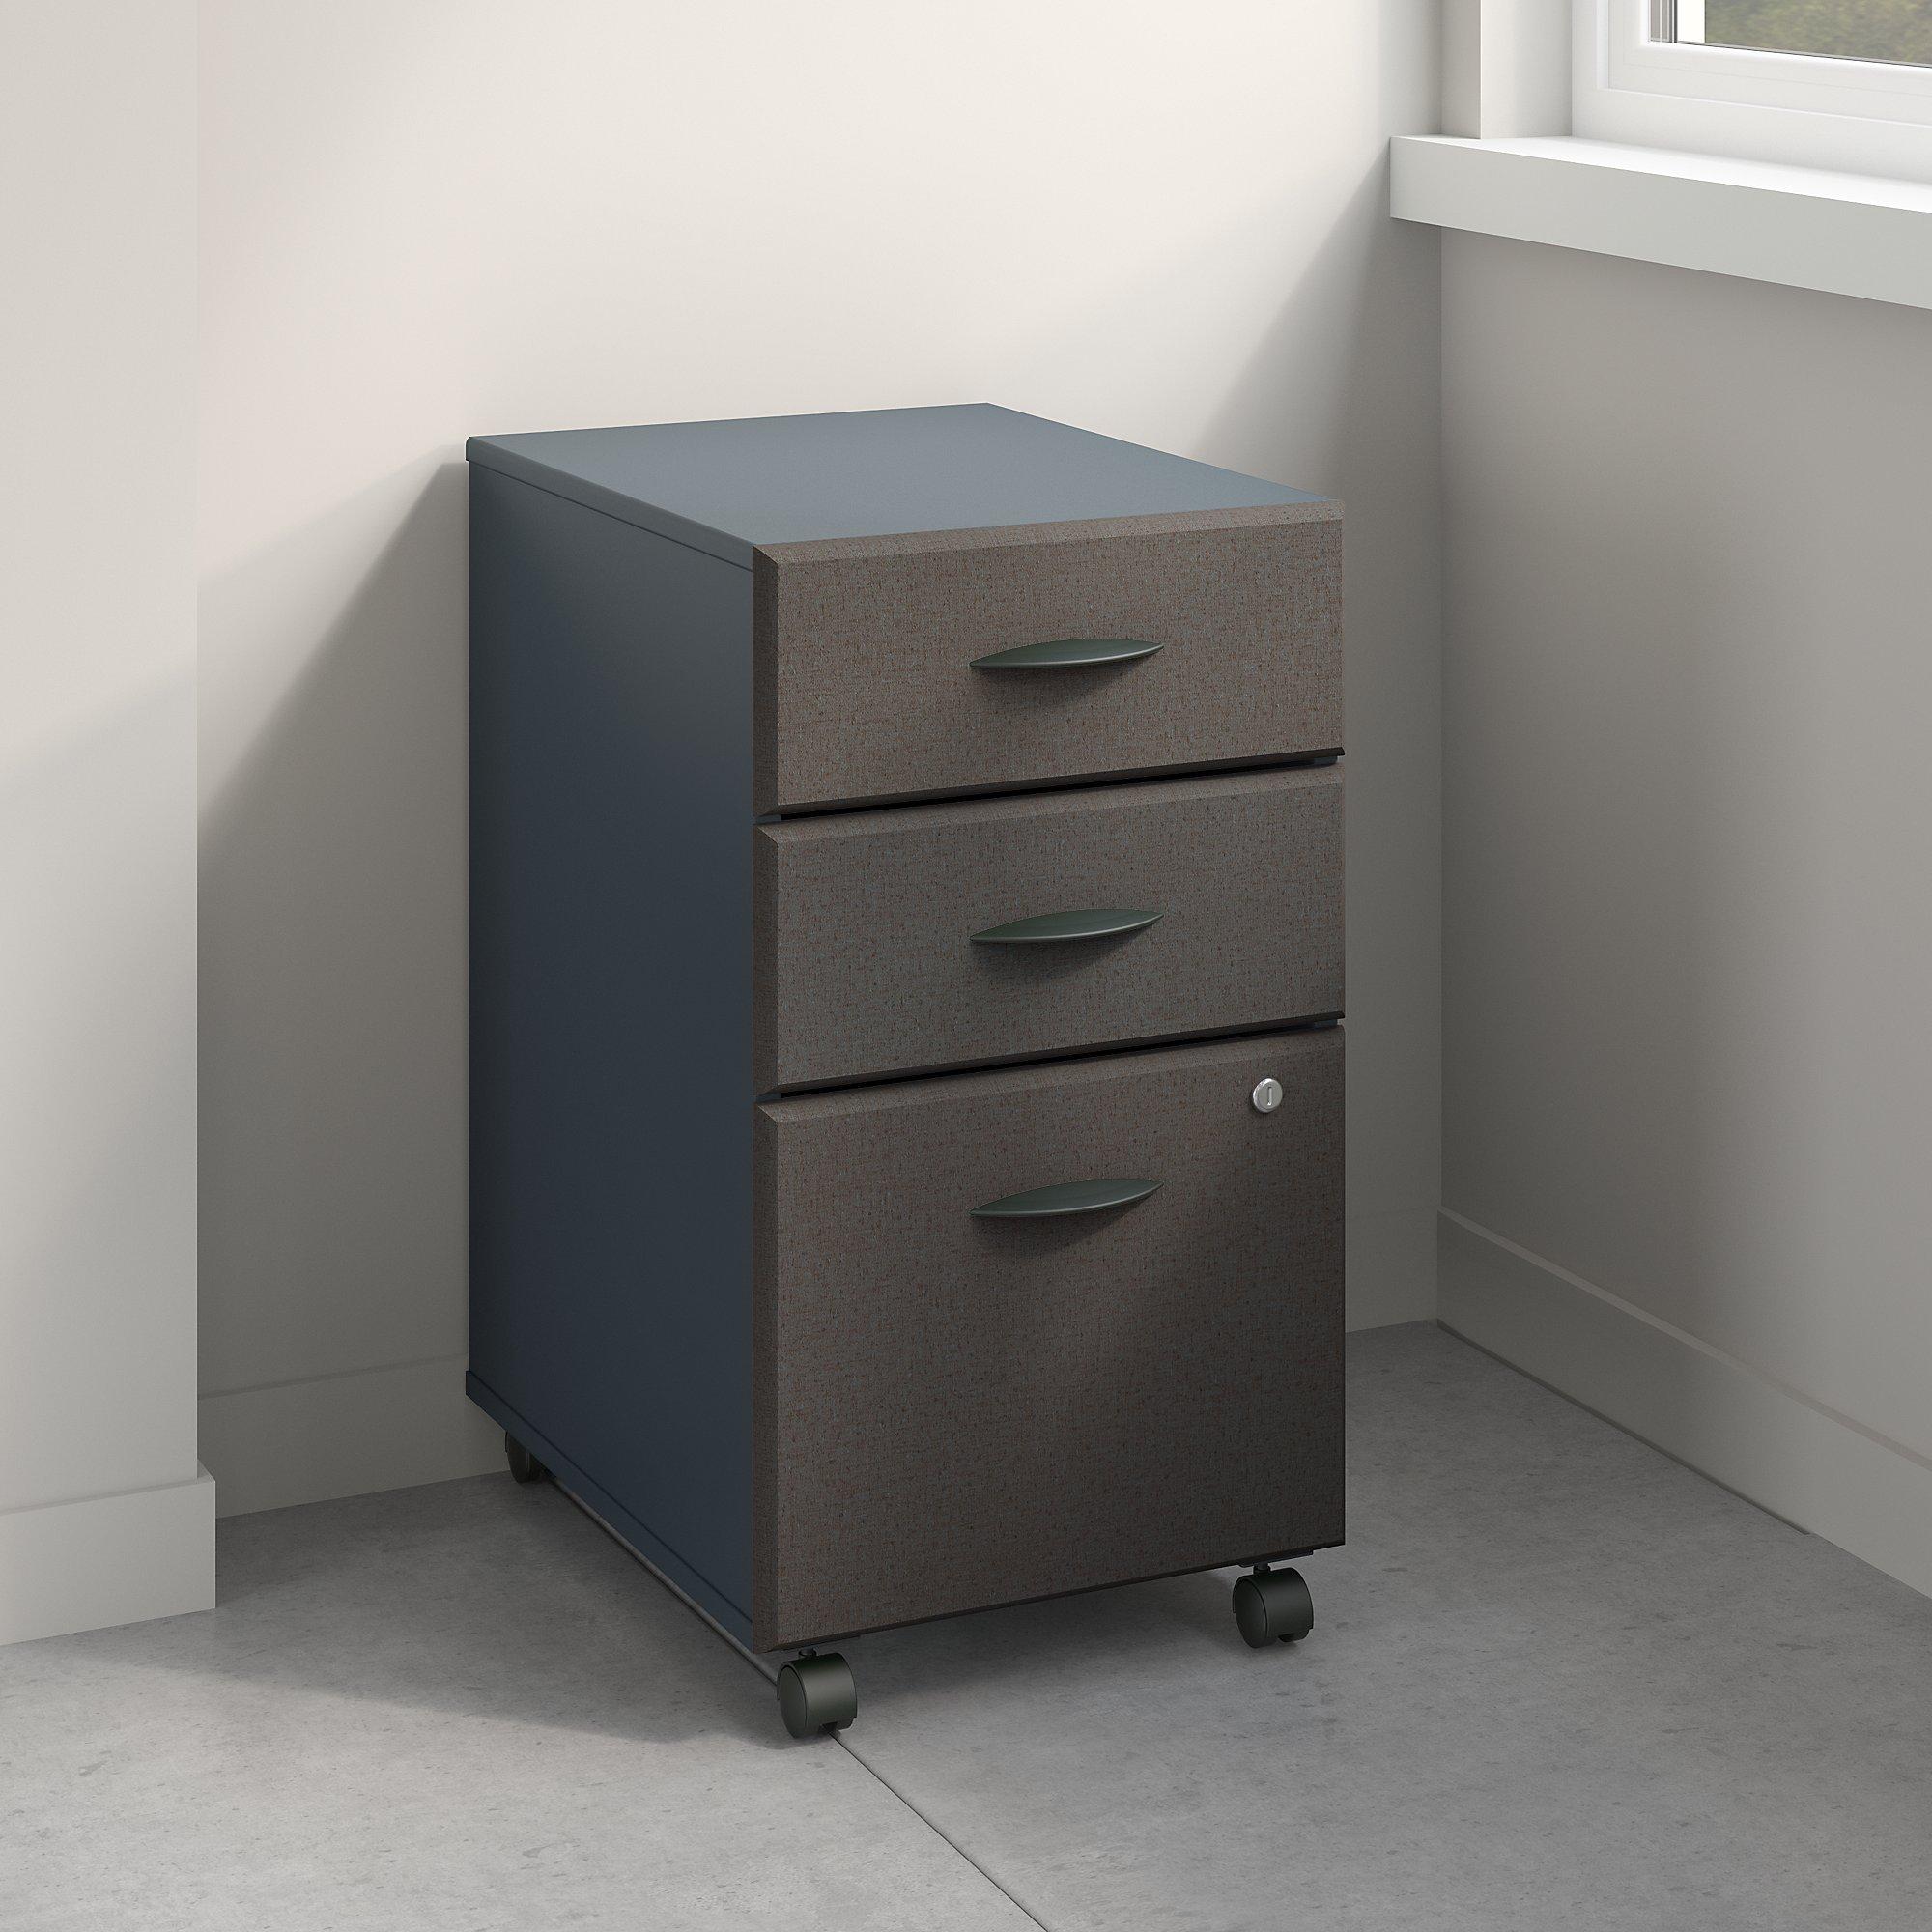 Bush Business Furniture WC84853PSU Series A 3 Drawer Mobile File Cabinet, Slate by Bush Business Furniture